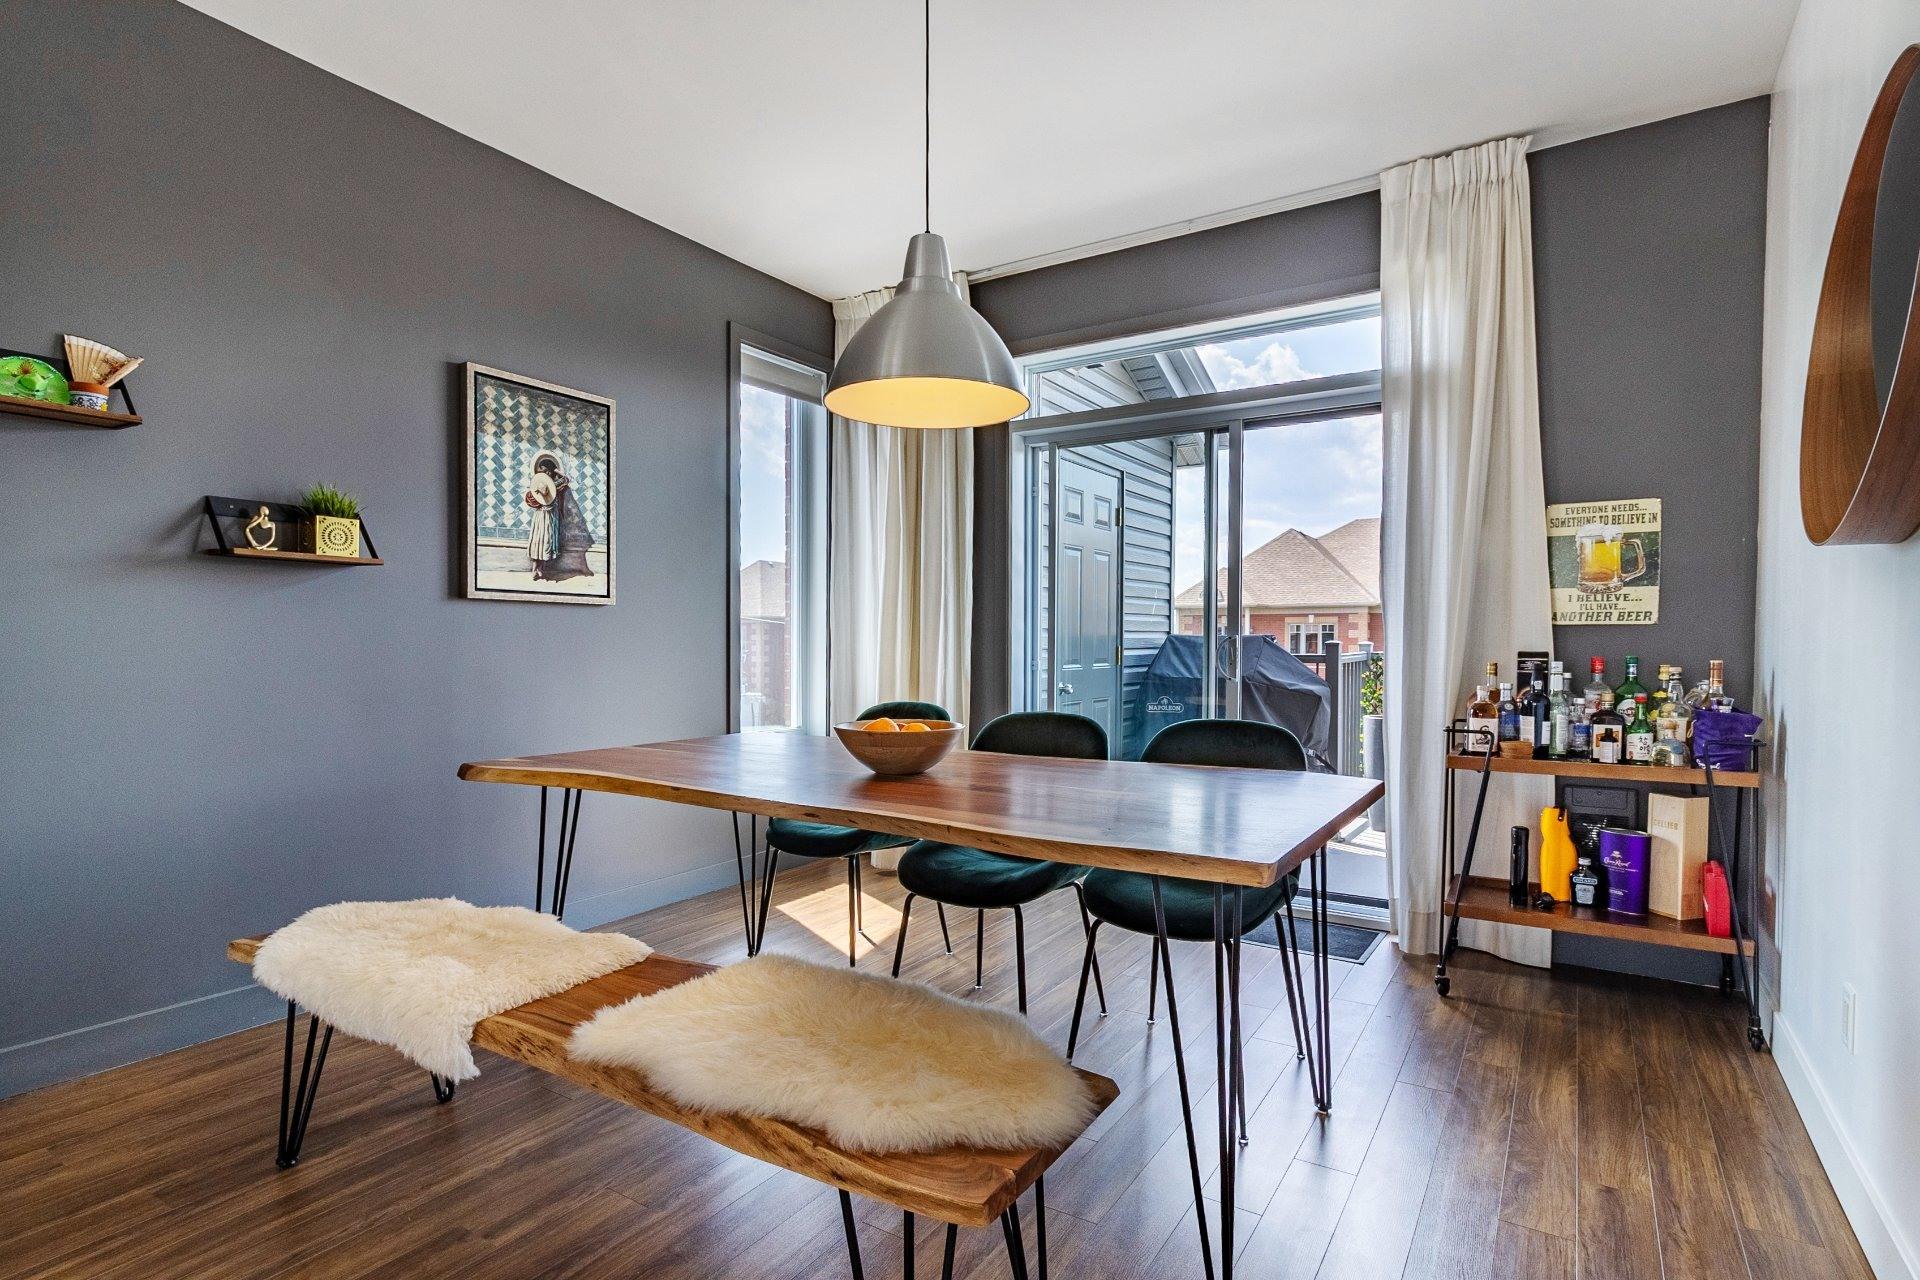 image 13 - Apartment For sale Saint-Hubert Longueuil  - 7 rooms